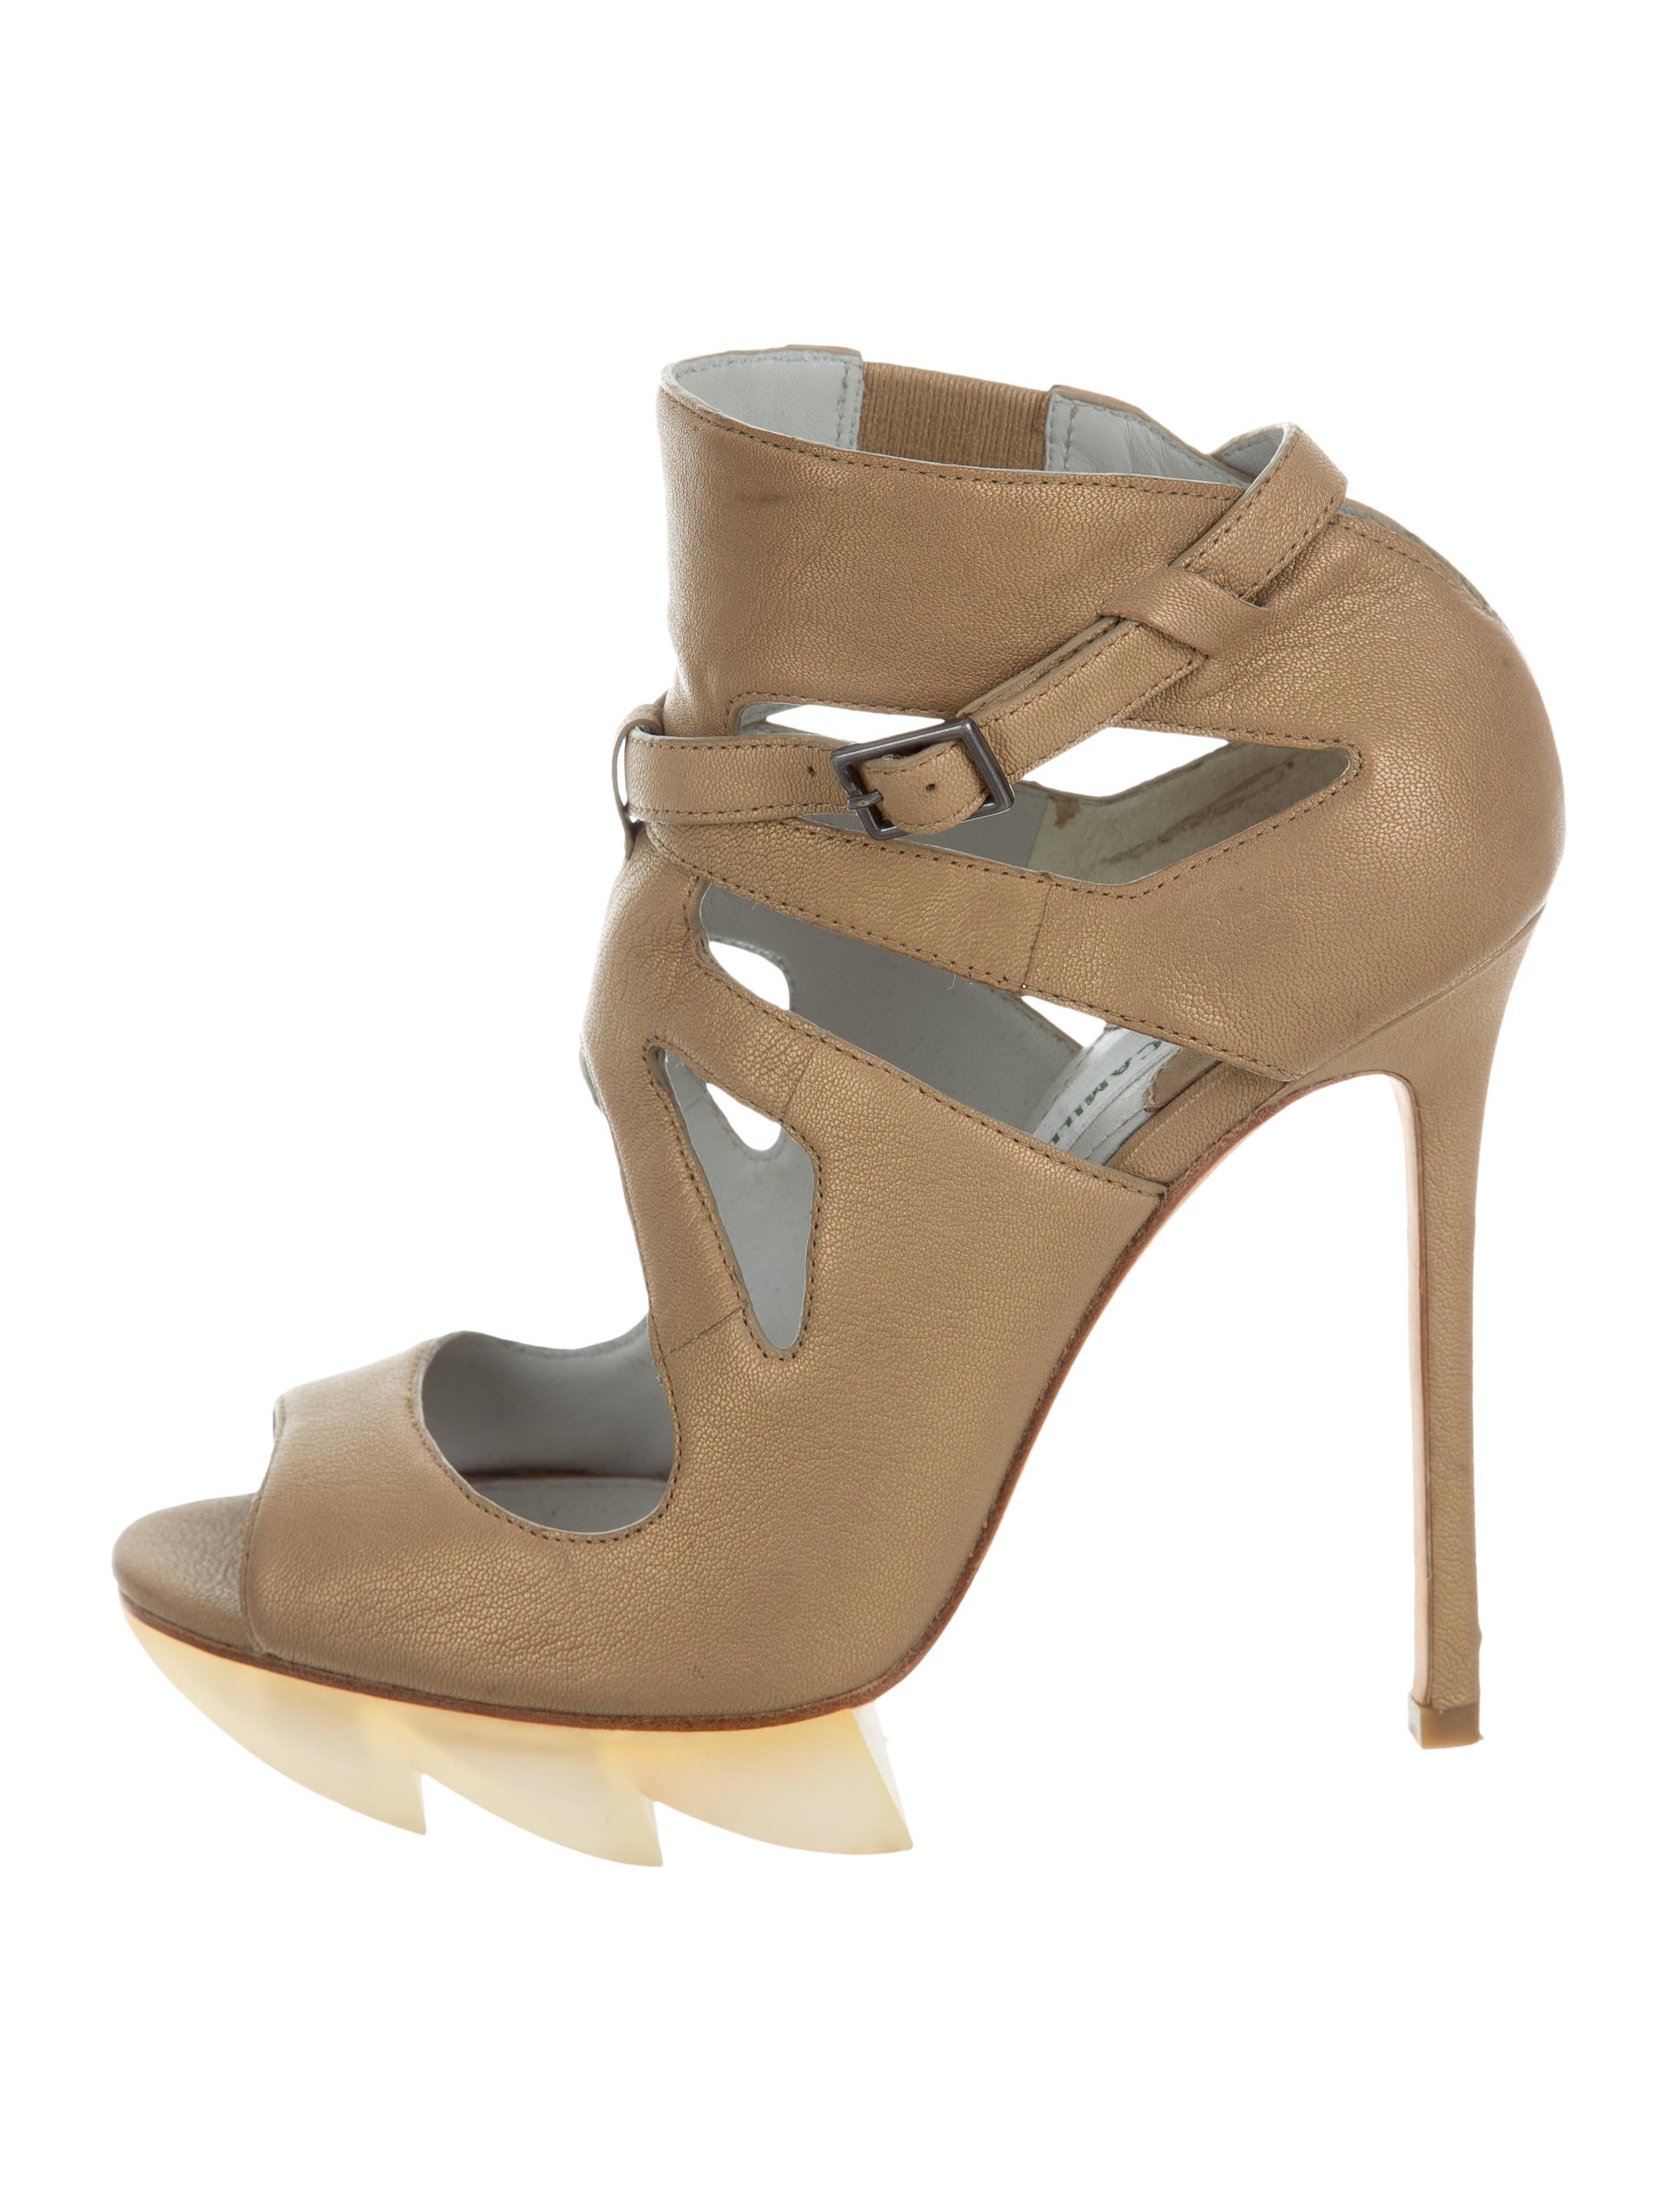 Camilla Skovgaard Metallic Platform Sandals cheap finishline store cheap price buy cheap limited edition cWCRbKq